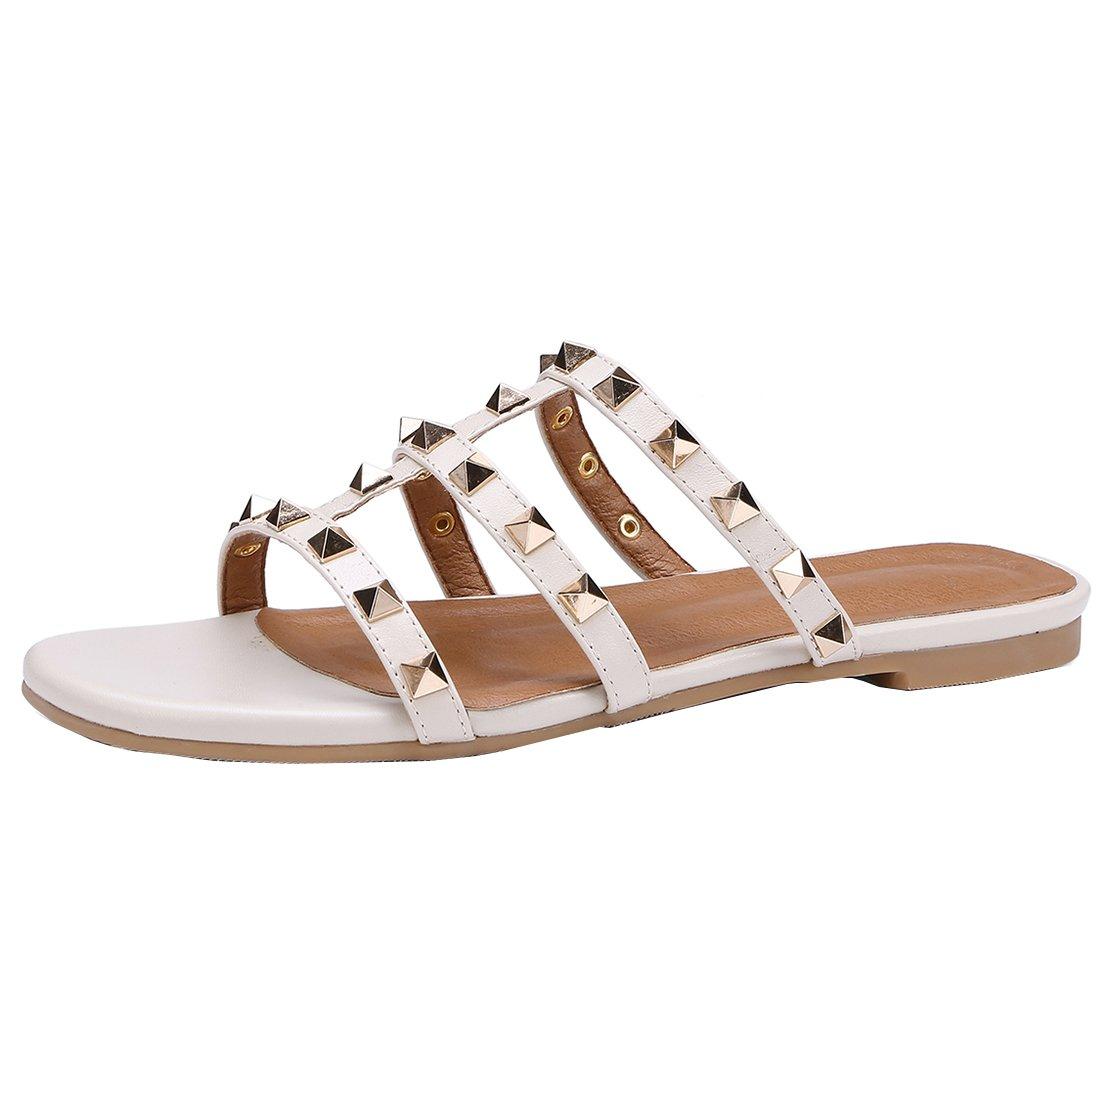 AIYOUMEI Sommer Outdoor Pantoffeln mit Nieten Flash Slipper Damen Bequeme Sandalen Schuhe  40 EU|Beige